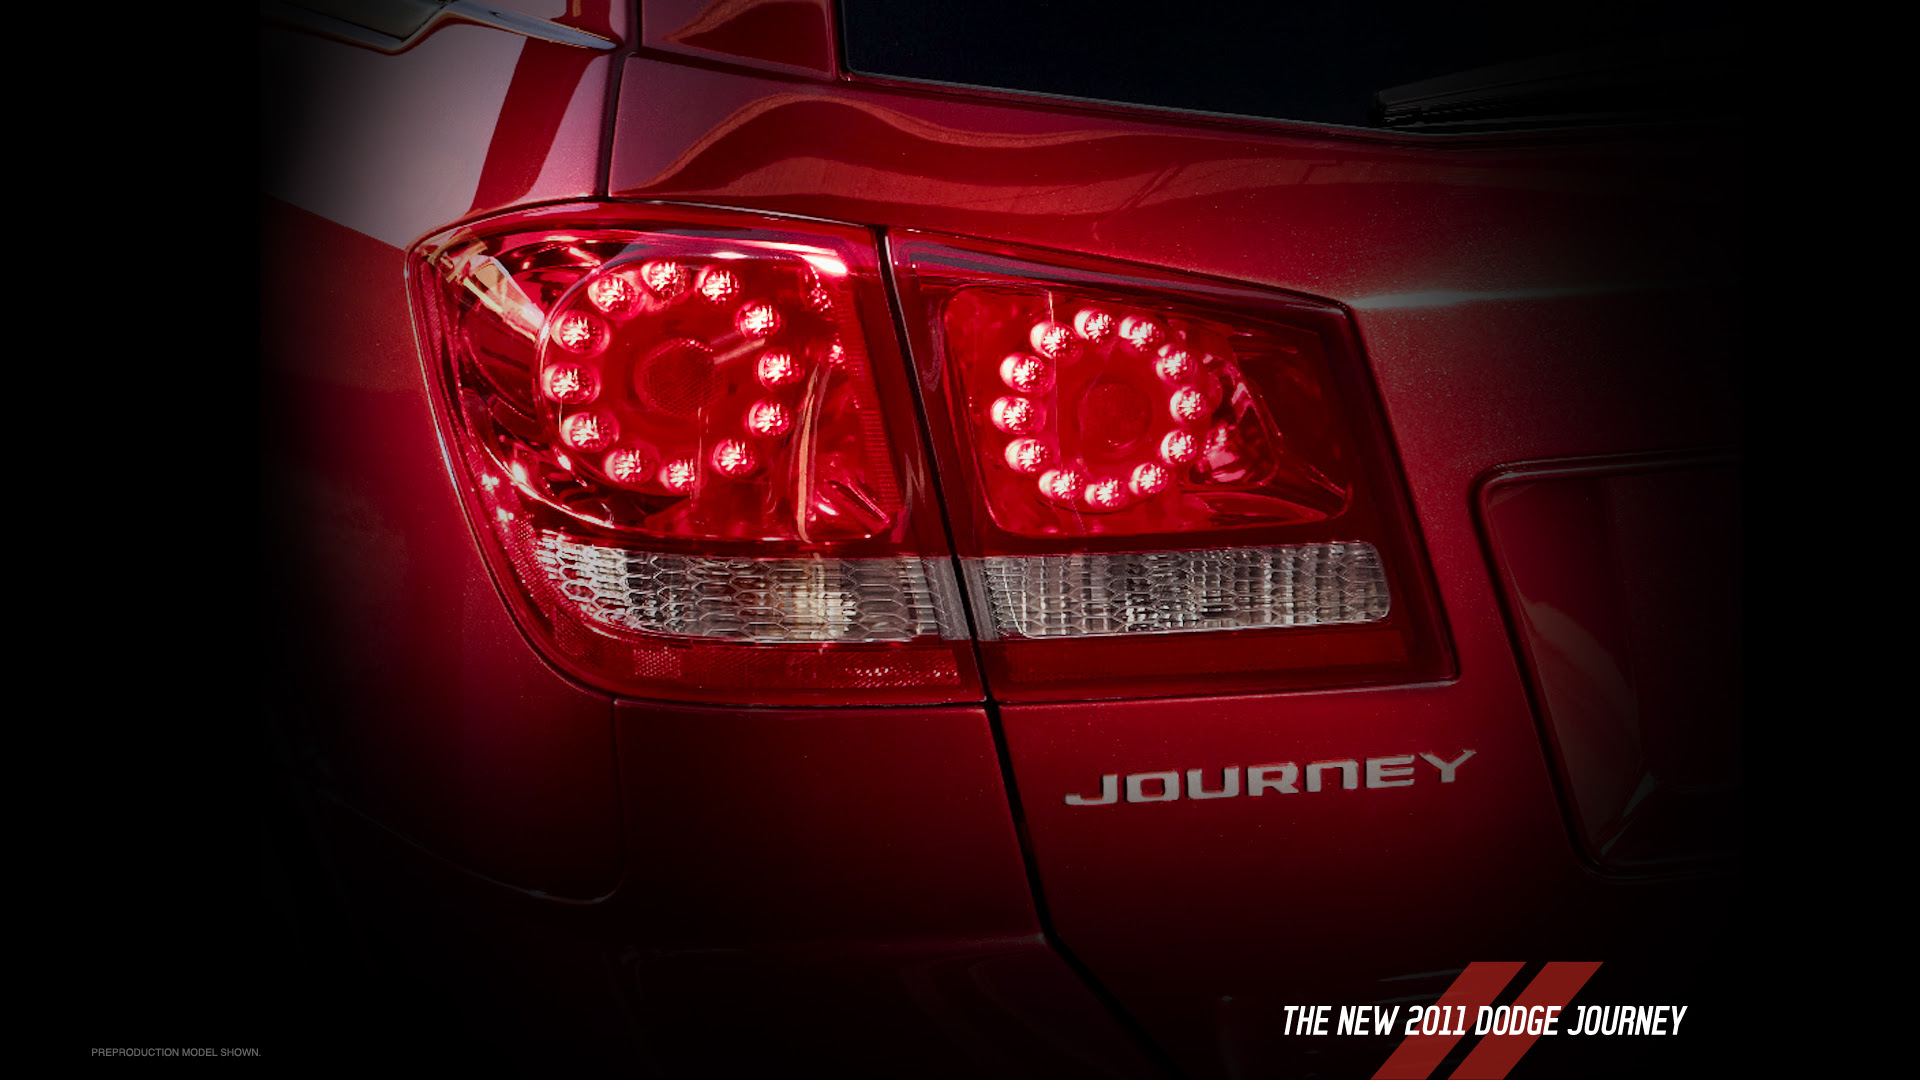 Dodge Journey for 2011.